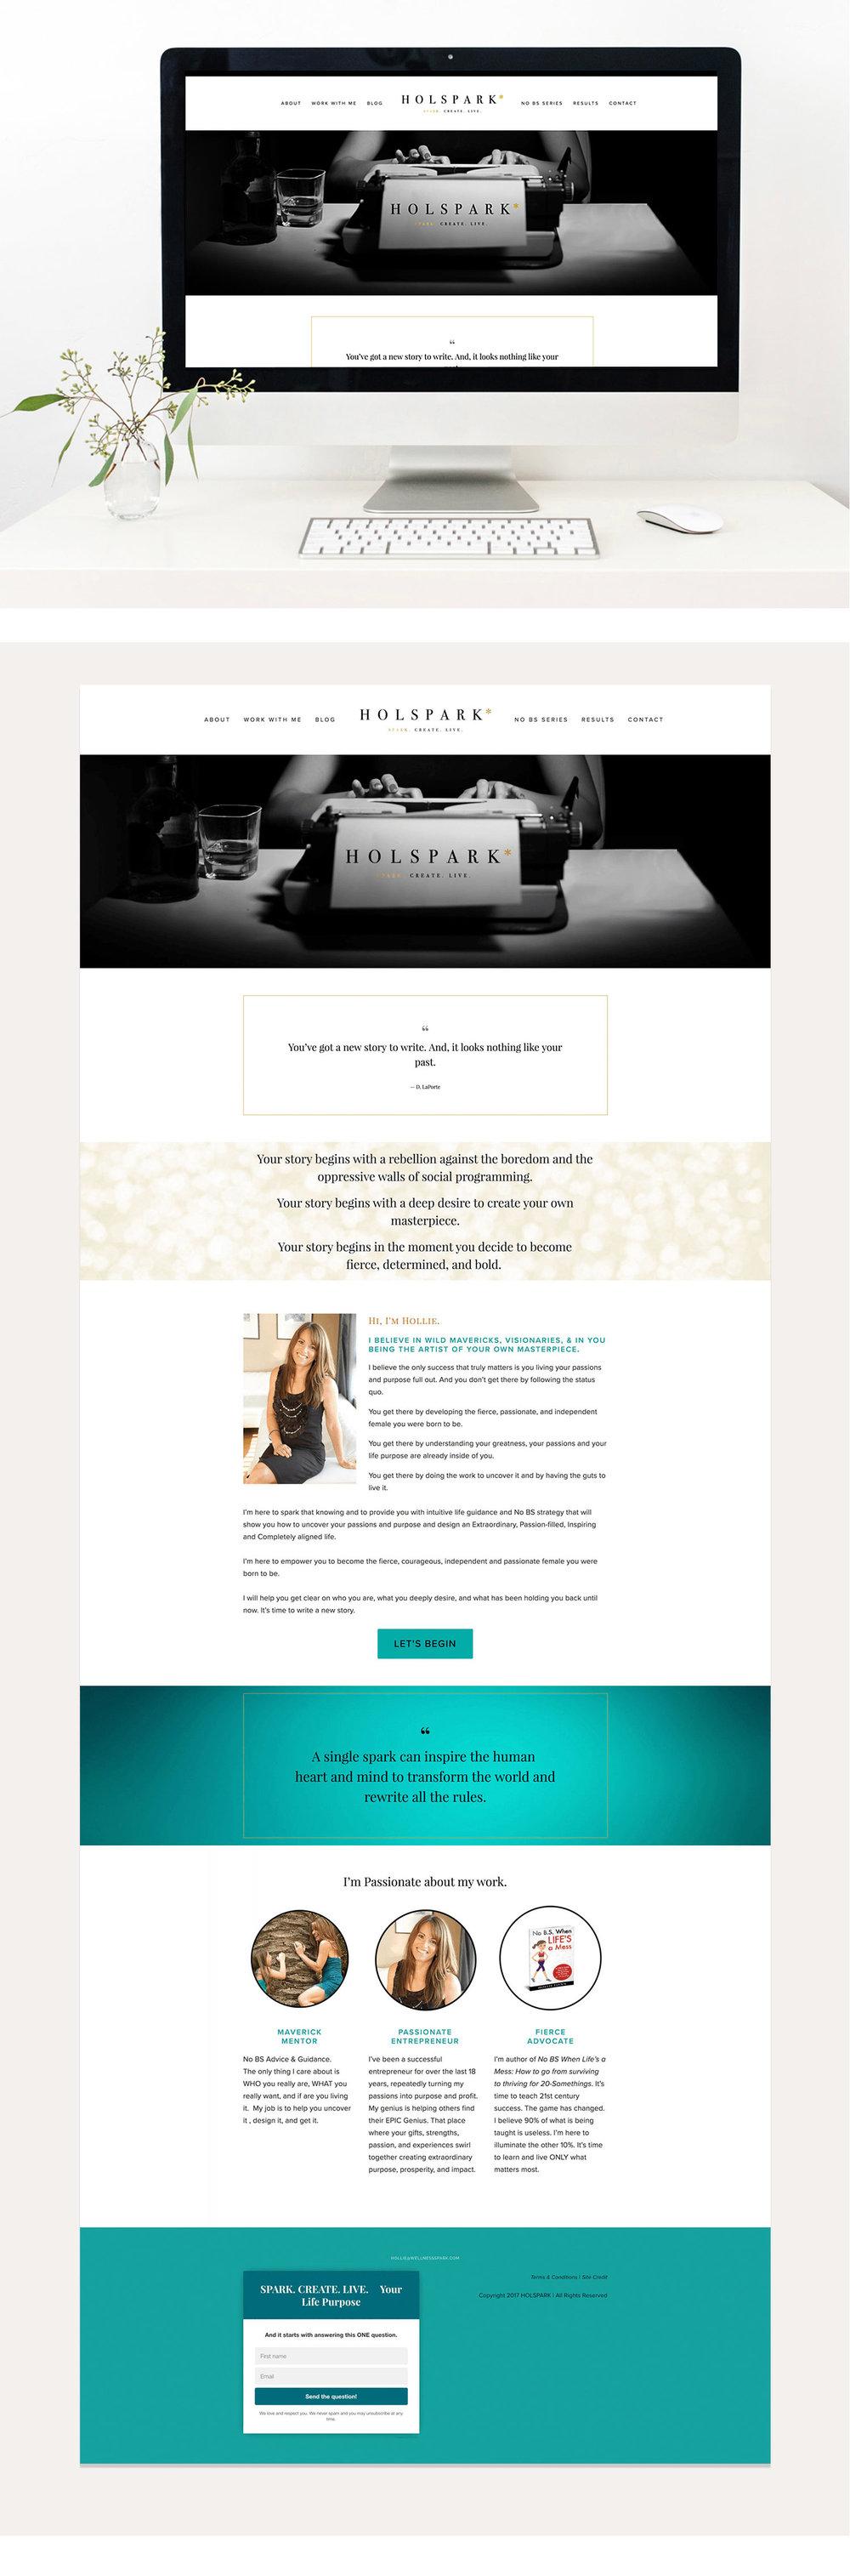 HOLSPARK Home page | Squarespace Web design | Jodi Neufeld Design